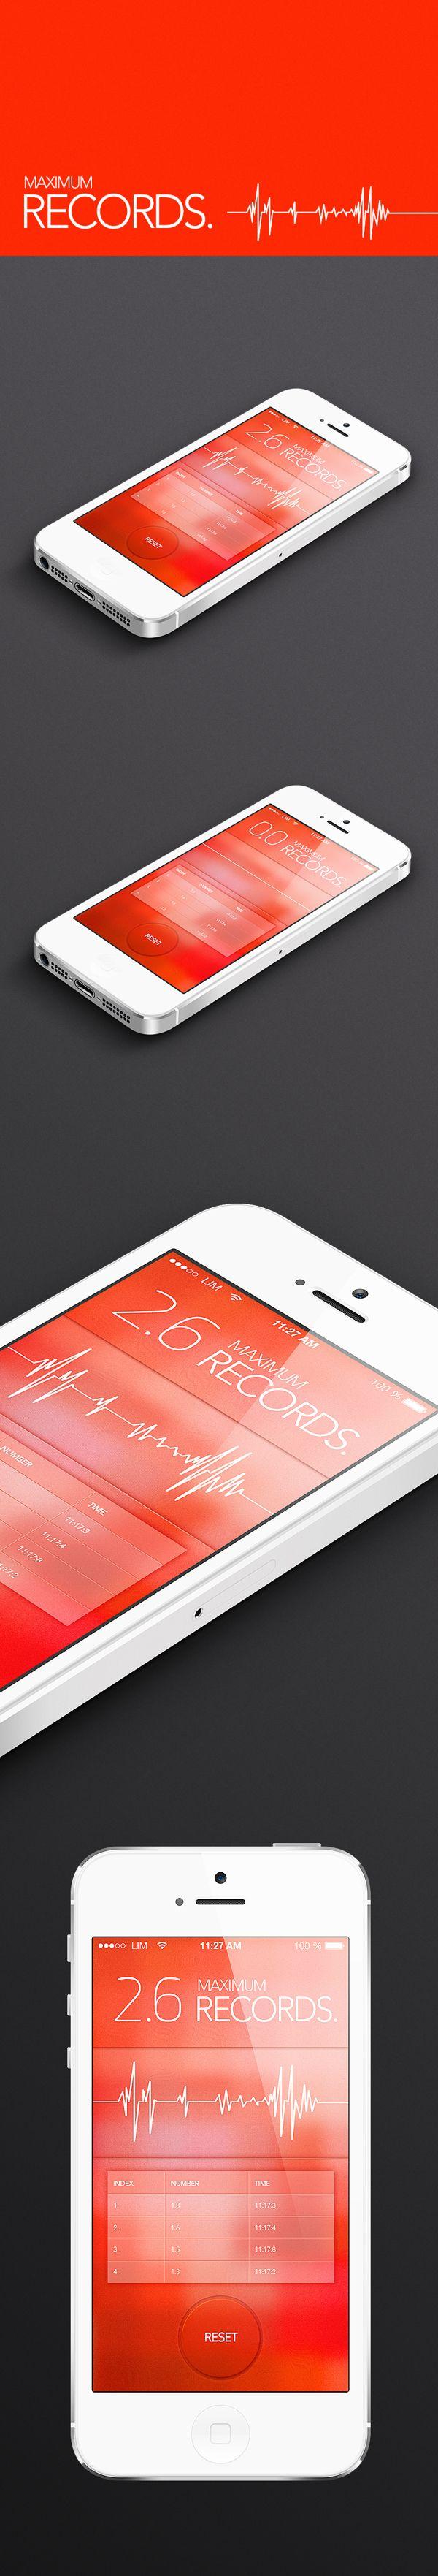 Maximum Records app by Hyelim Choi, via Behance